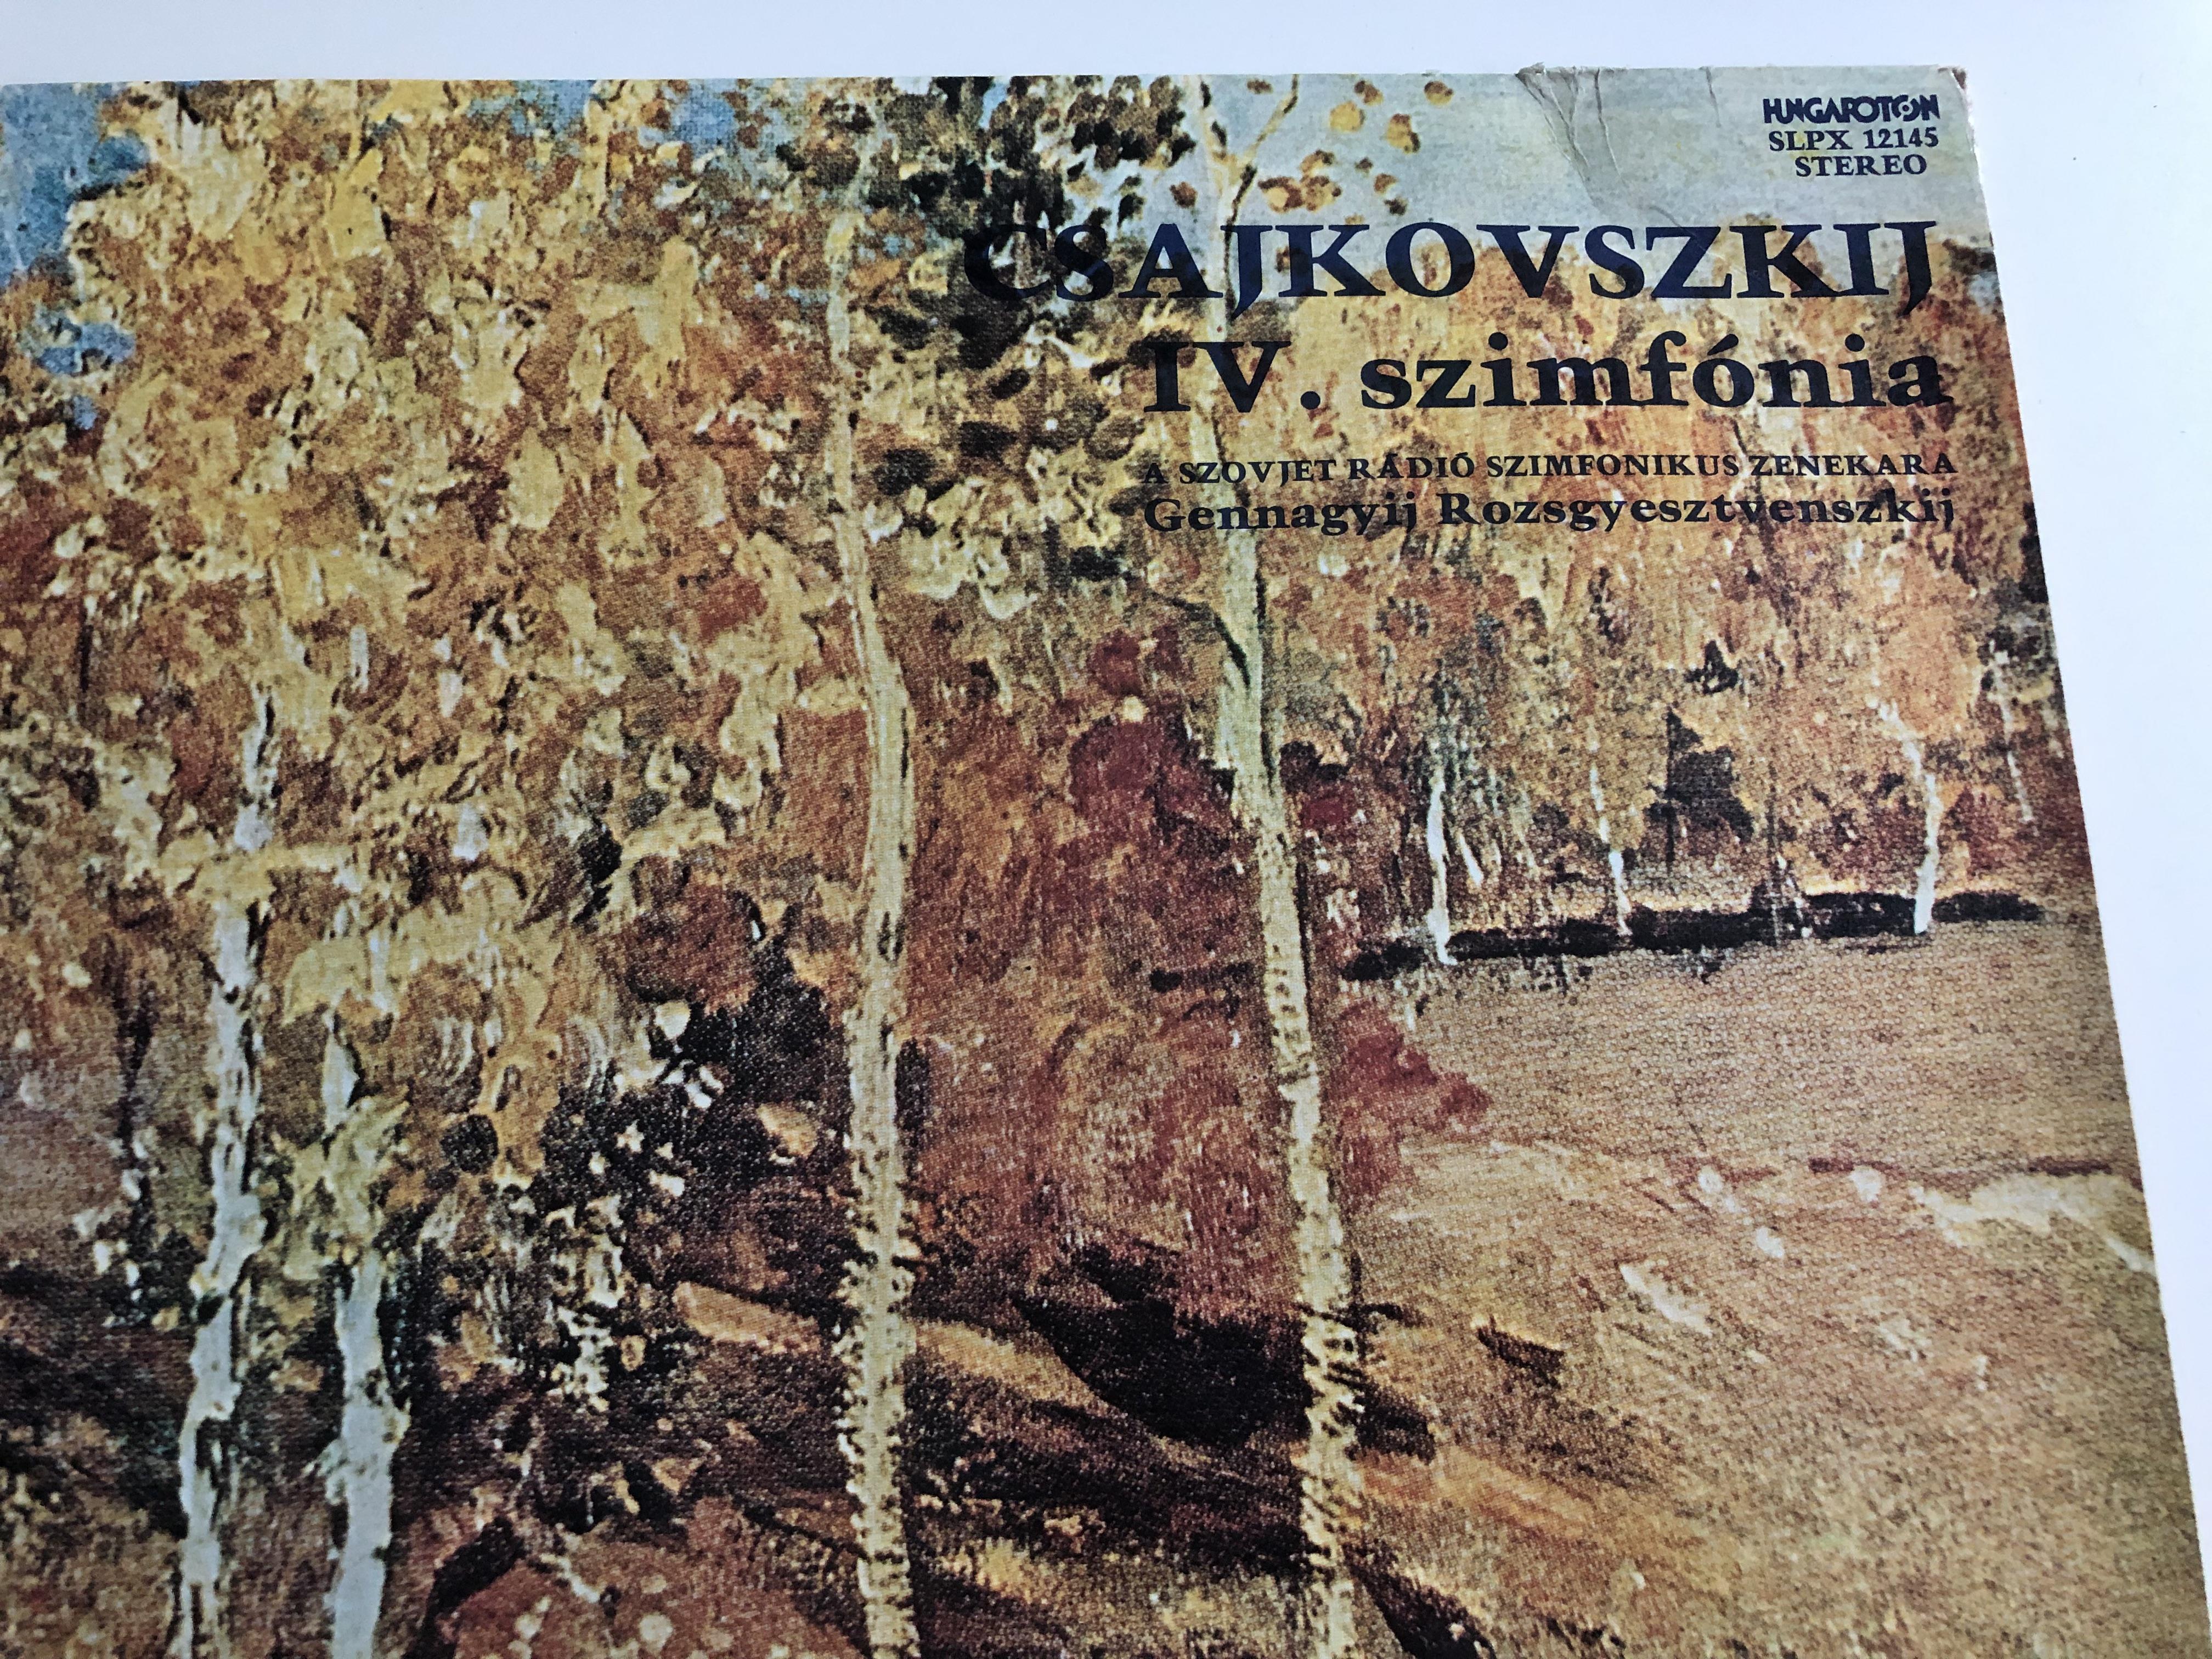 csajkovszkij-iv.-szimf-nia-op.-36-a-szovjet-r-di-szimfonikus-zenekara-gennagyij-rozsgyesztvenszkij-hungaroton-lp-stereo-slpx-12145-2-.jpg